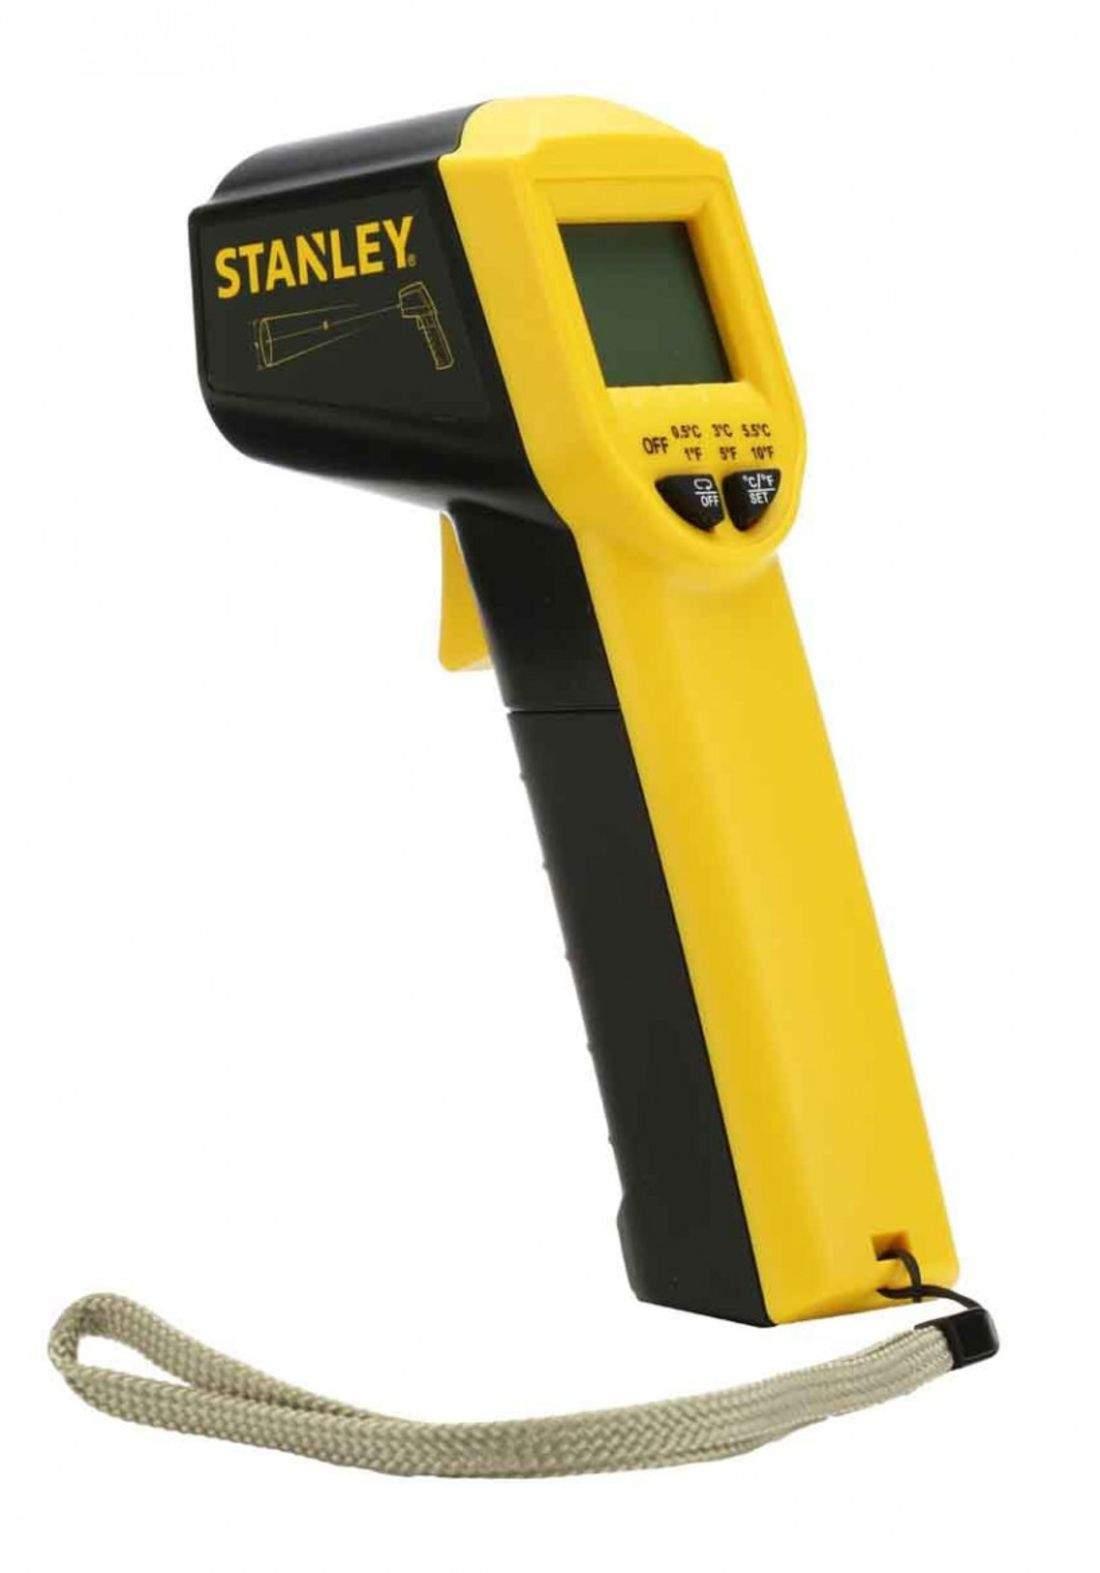 Stanley STHT0-77365 Digital Infrared Thermometer with -38°C to 520°C مقياس الحرارة الرقمي